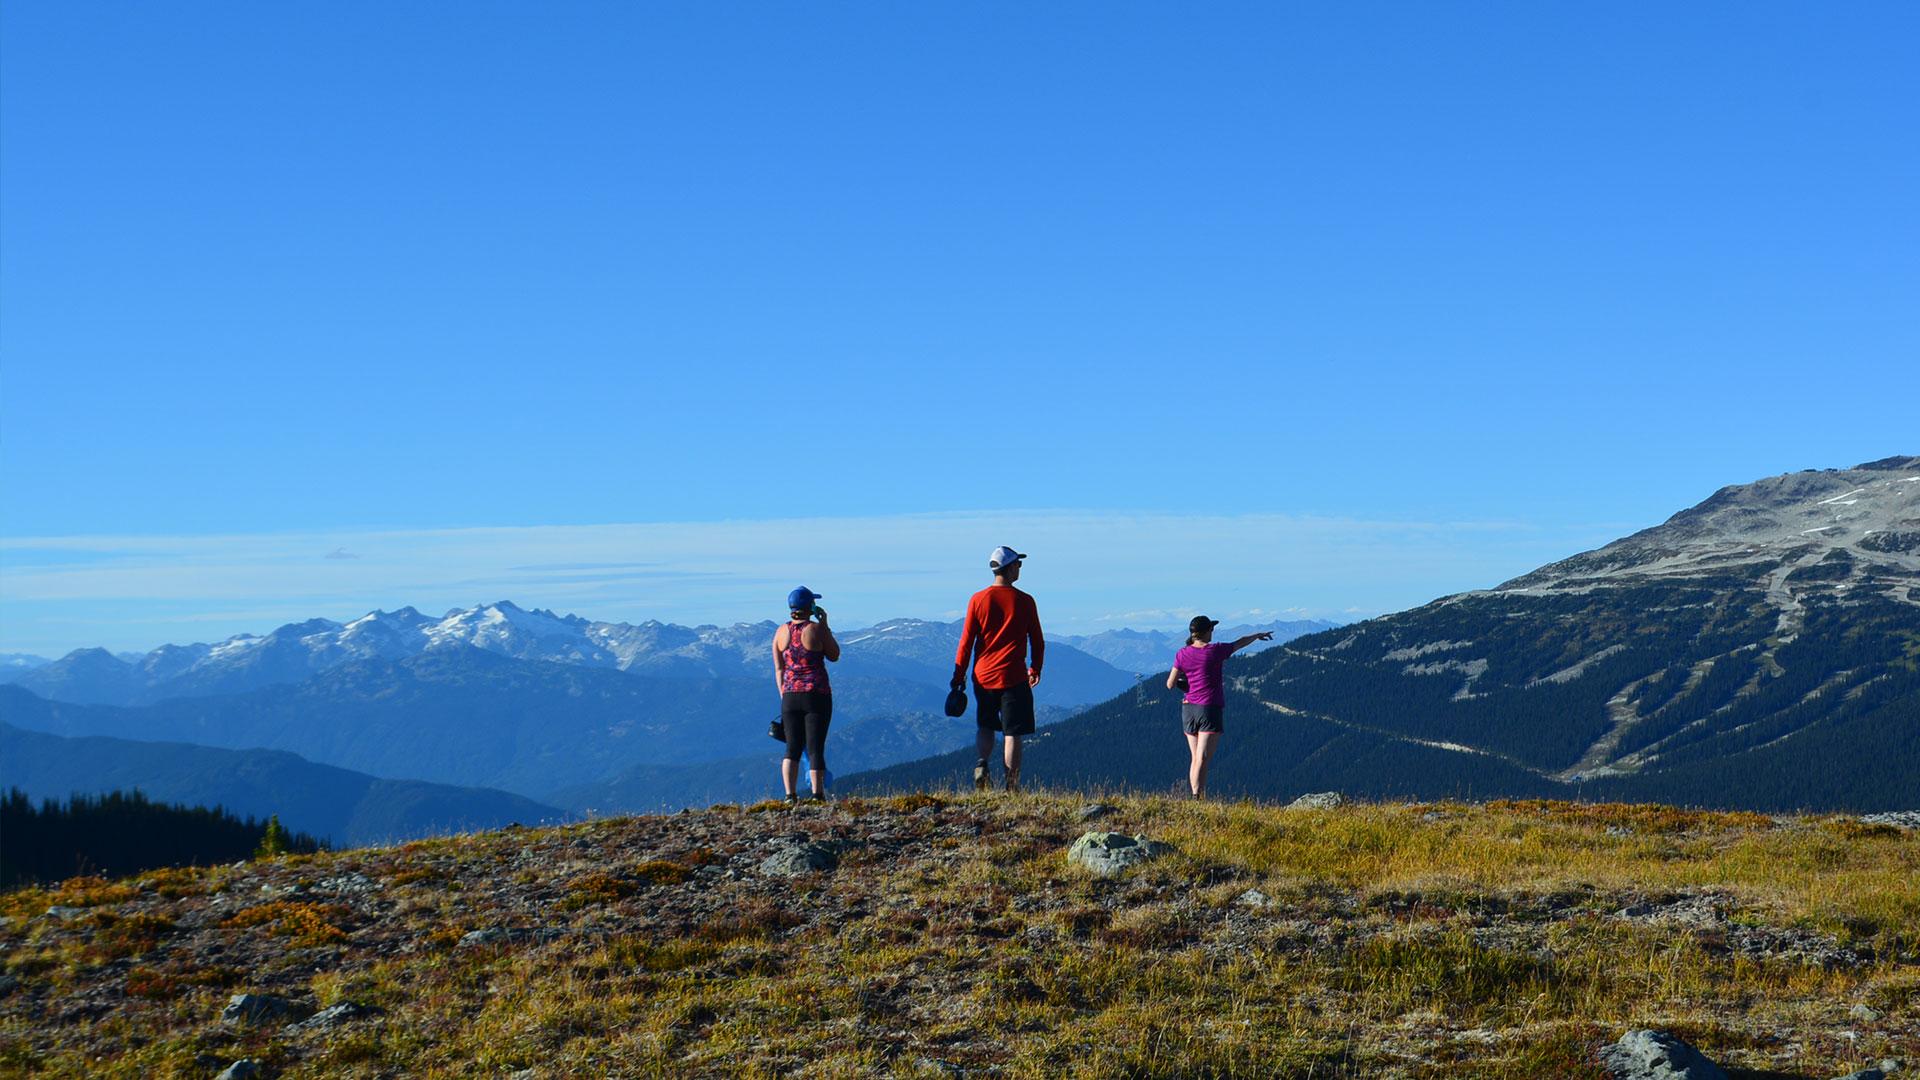 Hiking in an alpine setting on whistler mountain